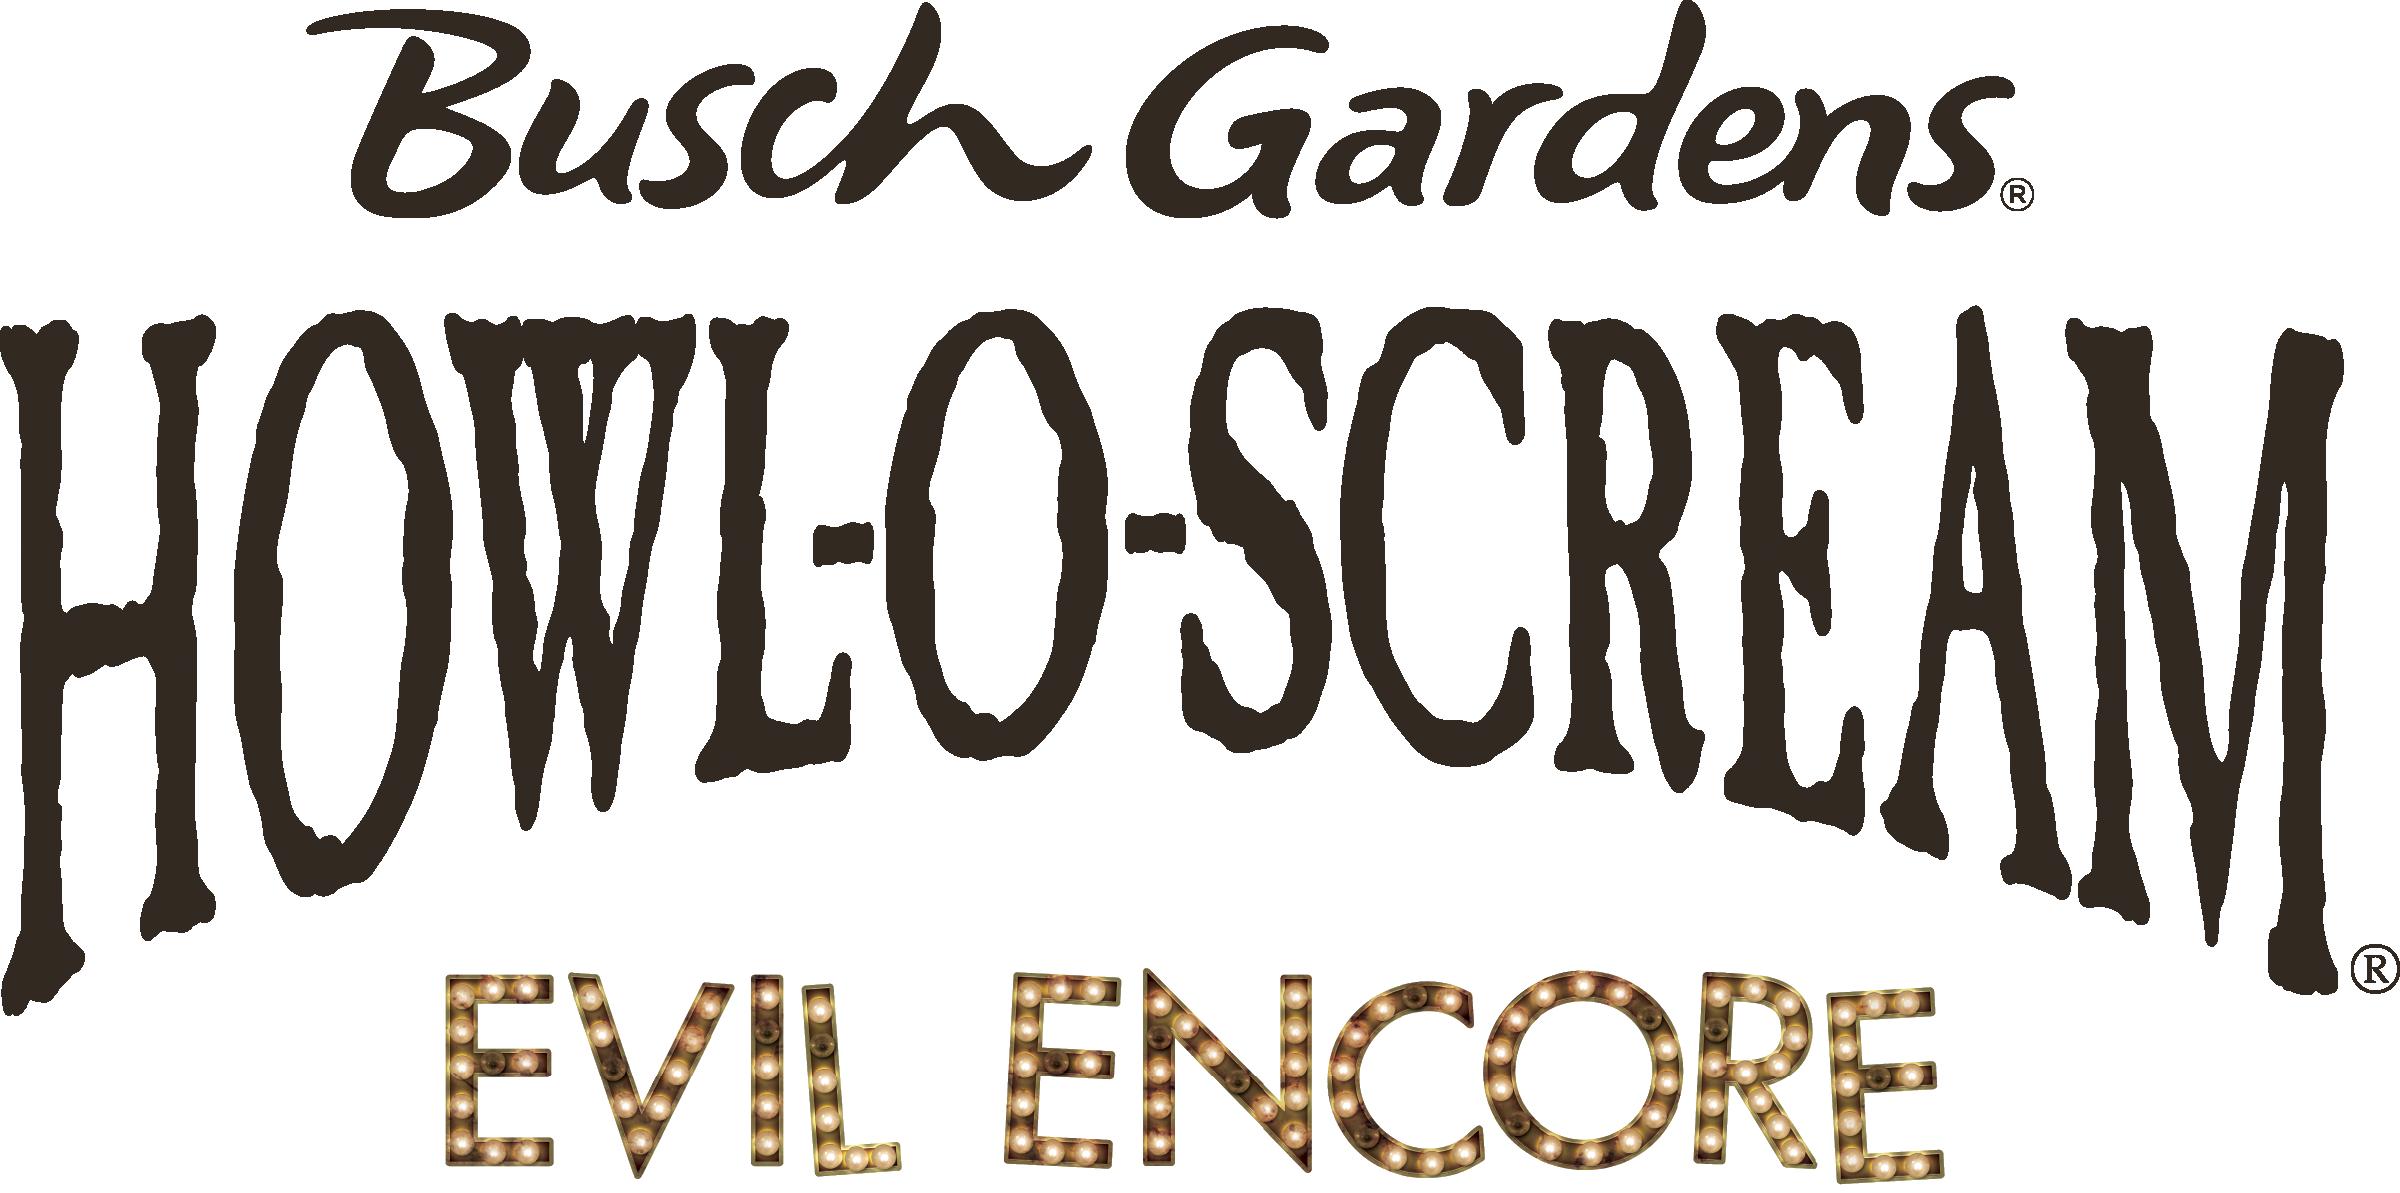 2016 Howl O Scream Halloween Event Now Open at Busch Gardens Tampa.